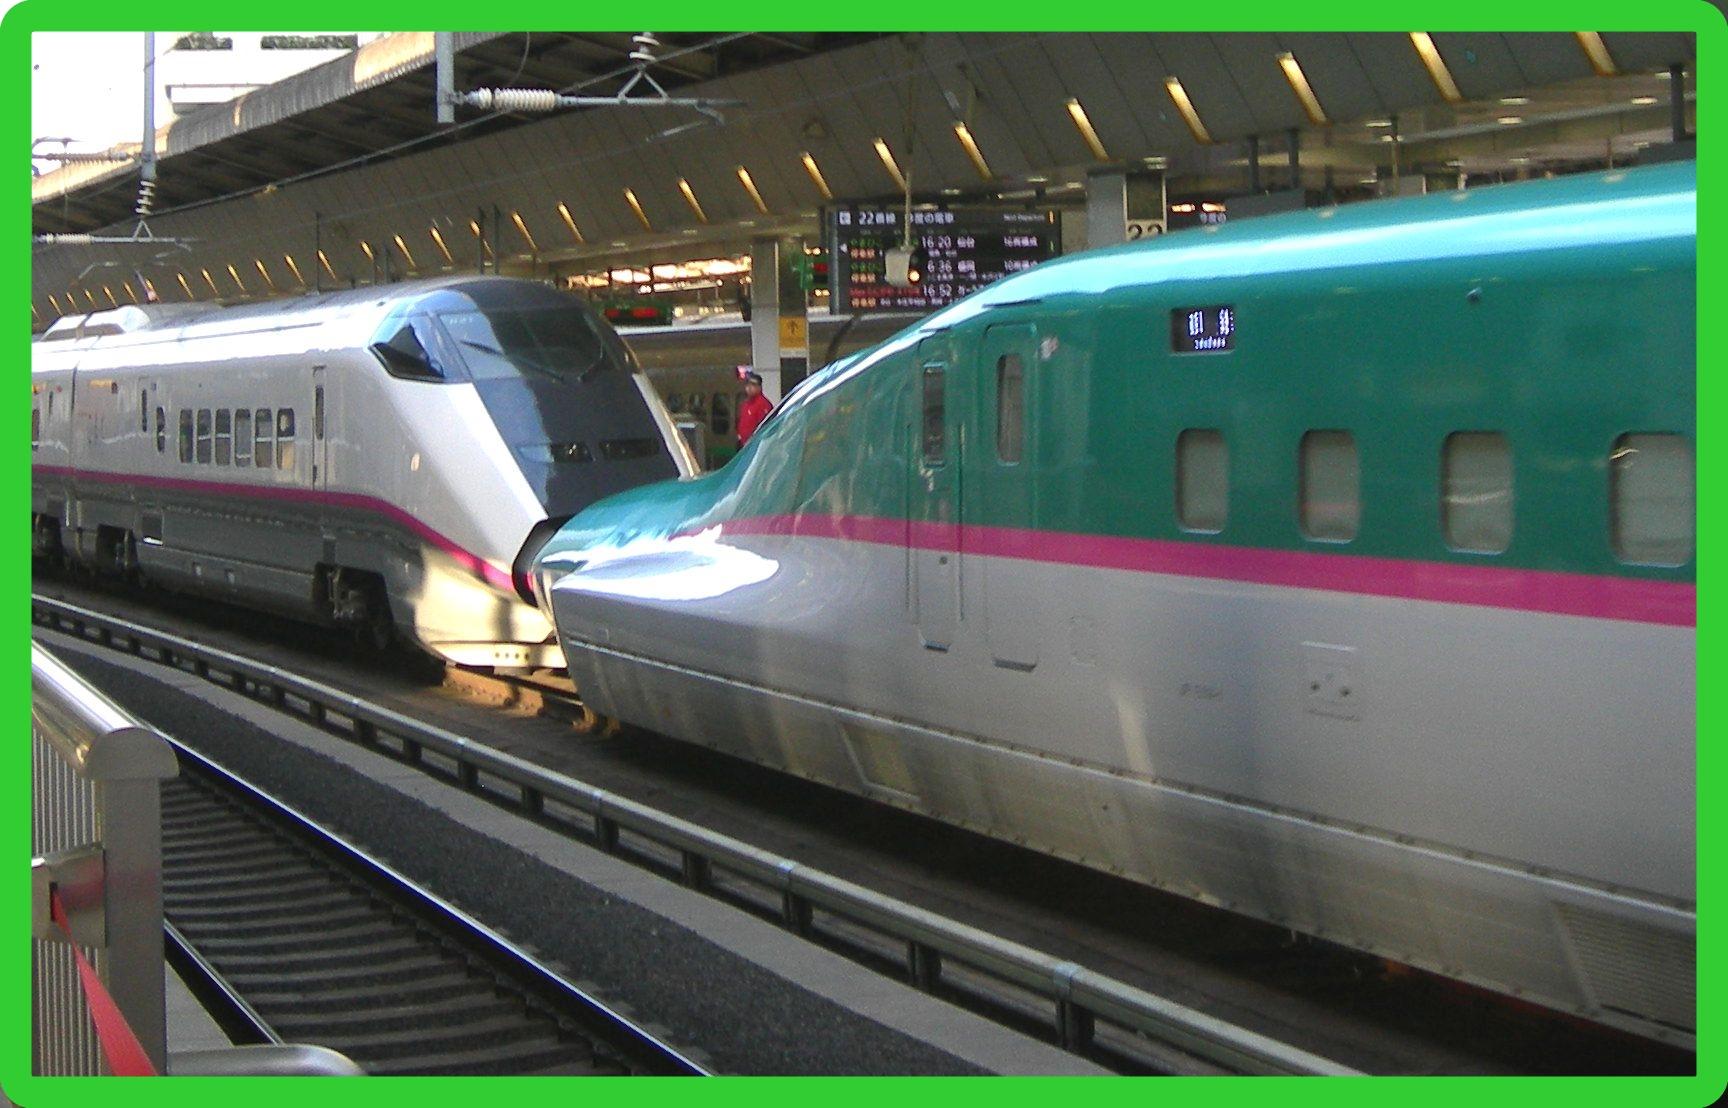 JR東日本、新幹線・特急の「車内文字ニュース」提供終了 スマホ、タブレット端末普及で